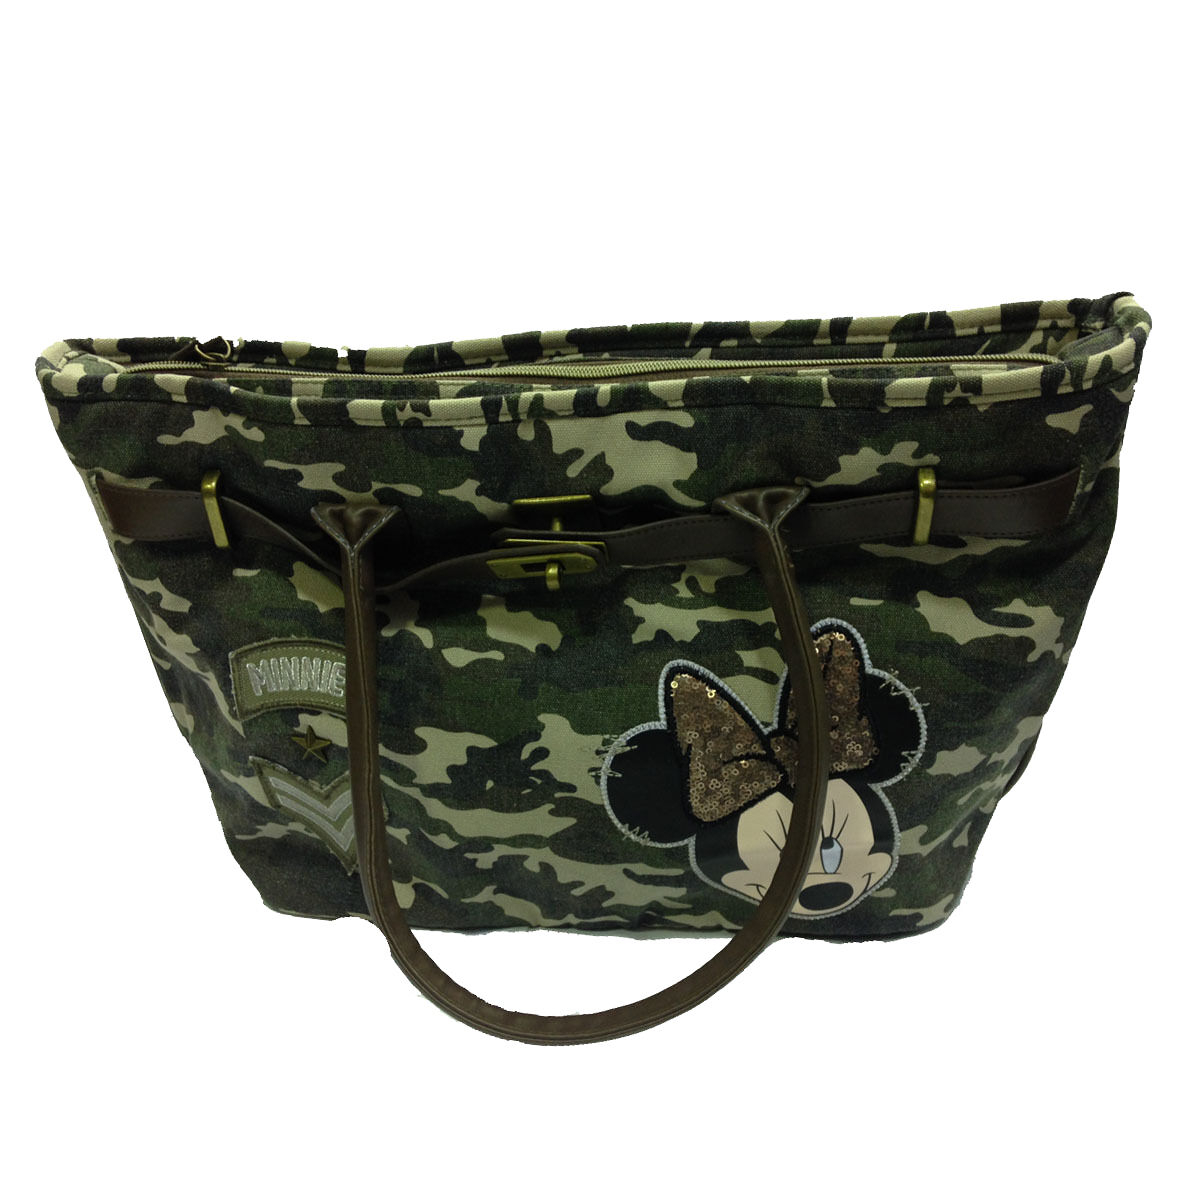 MINNIE borsa spalla shopper in stoffa camouflage vintage e pallet 27x47x14,5 cm